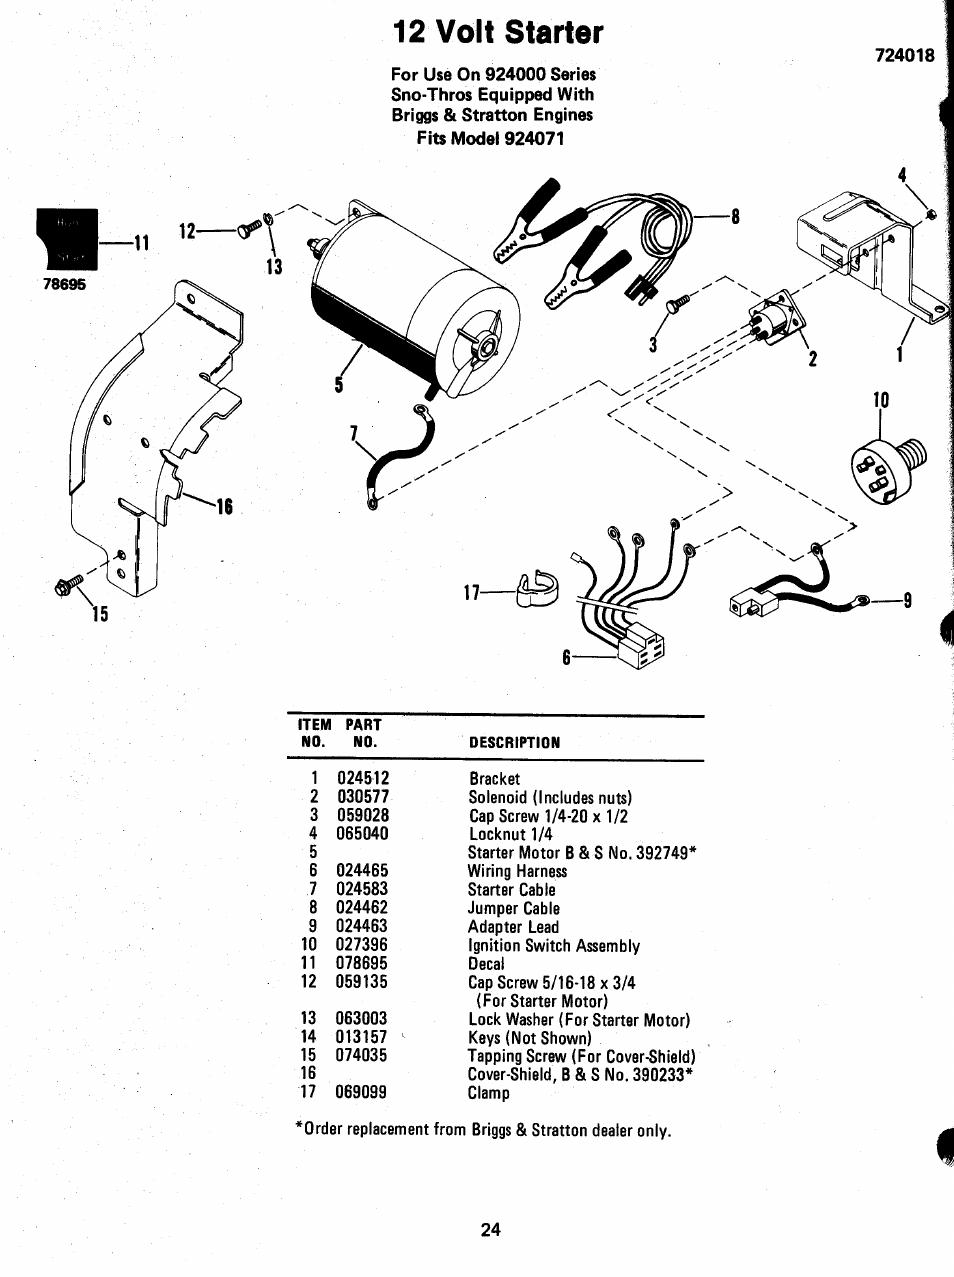 wiring harness decal starter omc schematic diagram T Harness for Remote Starter wiring harness decal starter omc wiring diagram data apc wiring harness wiring harness decal starter omc